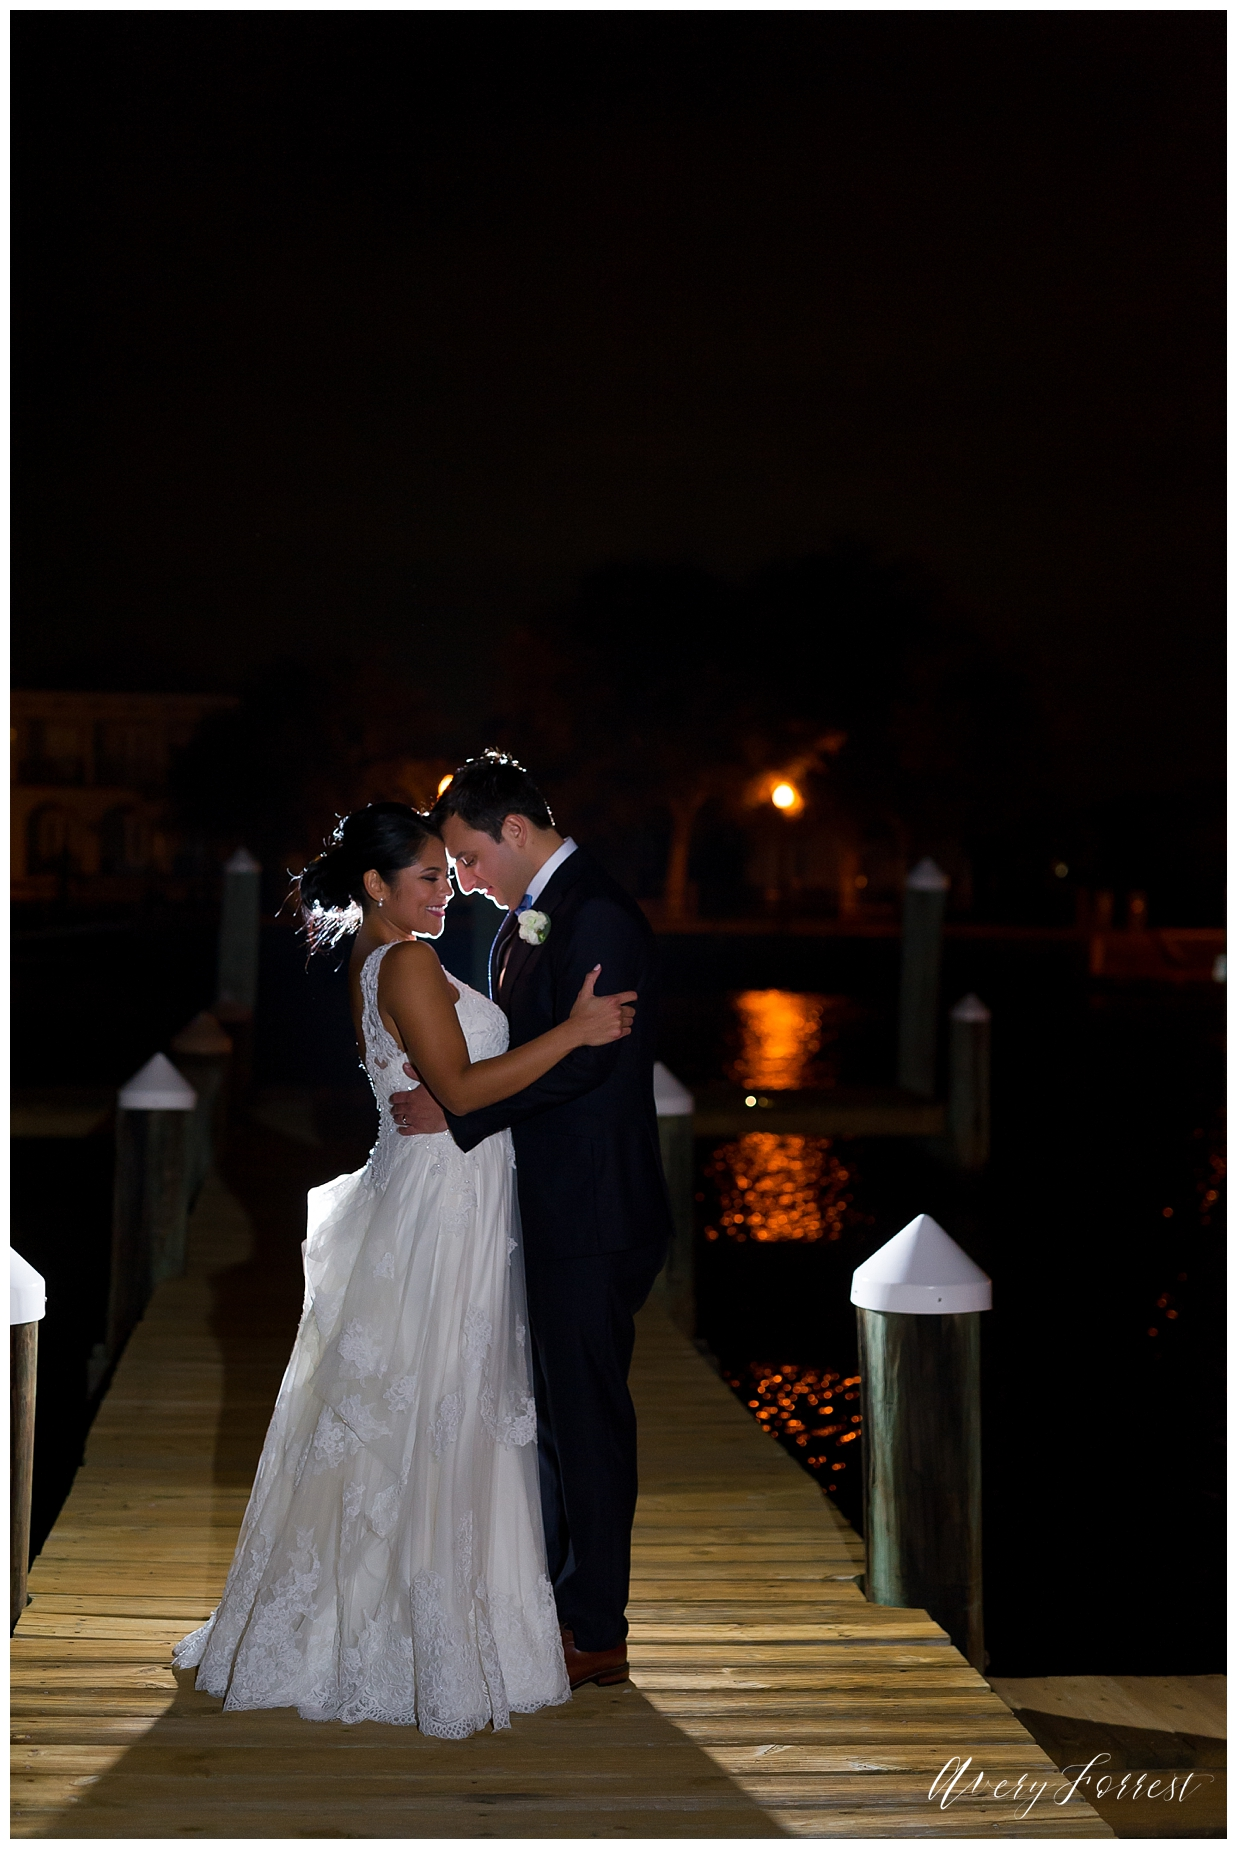 Pensacola Wedding, Palafox at the Warf, Elegant Church Wedding_0261.jpg